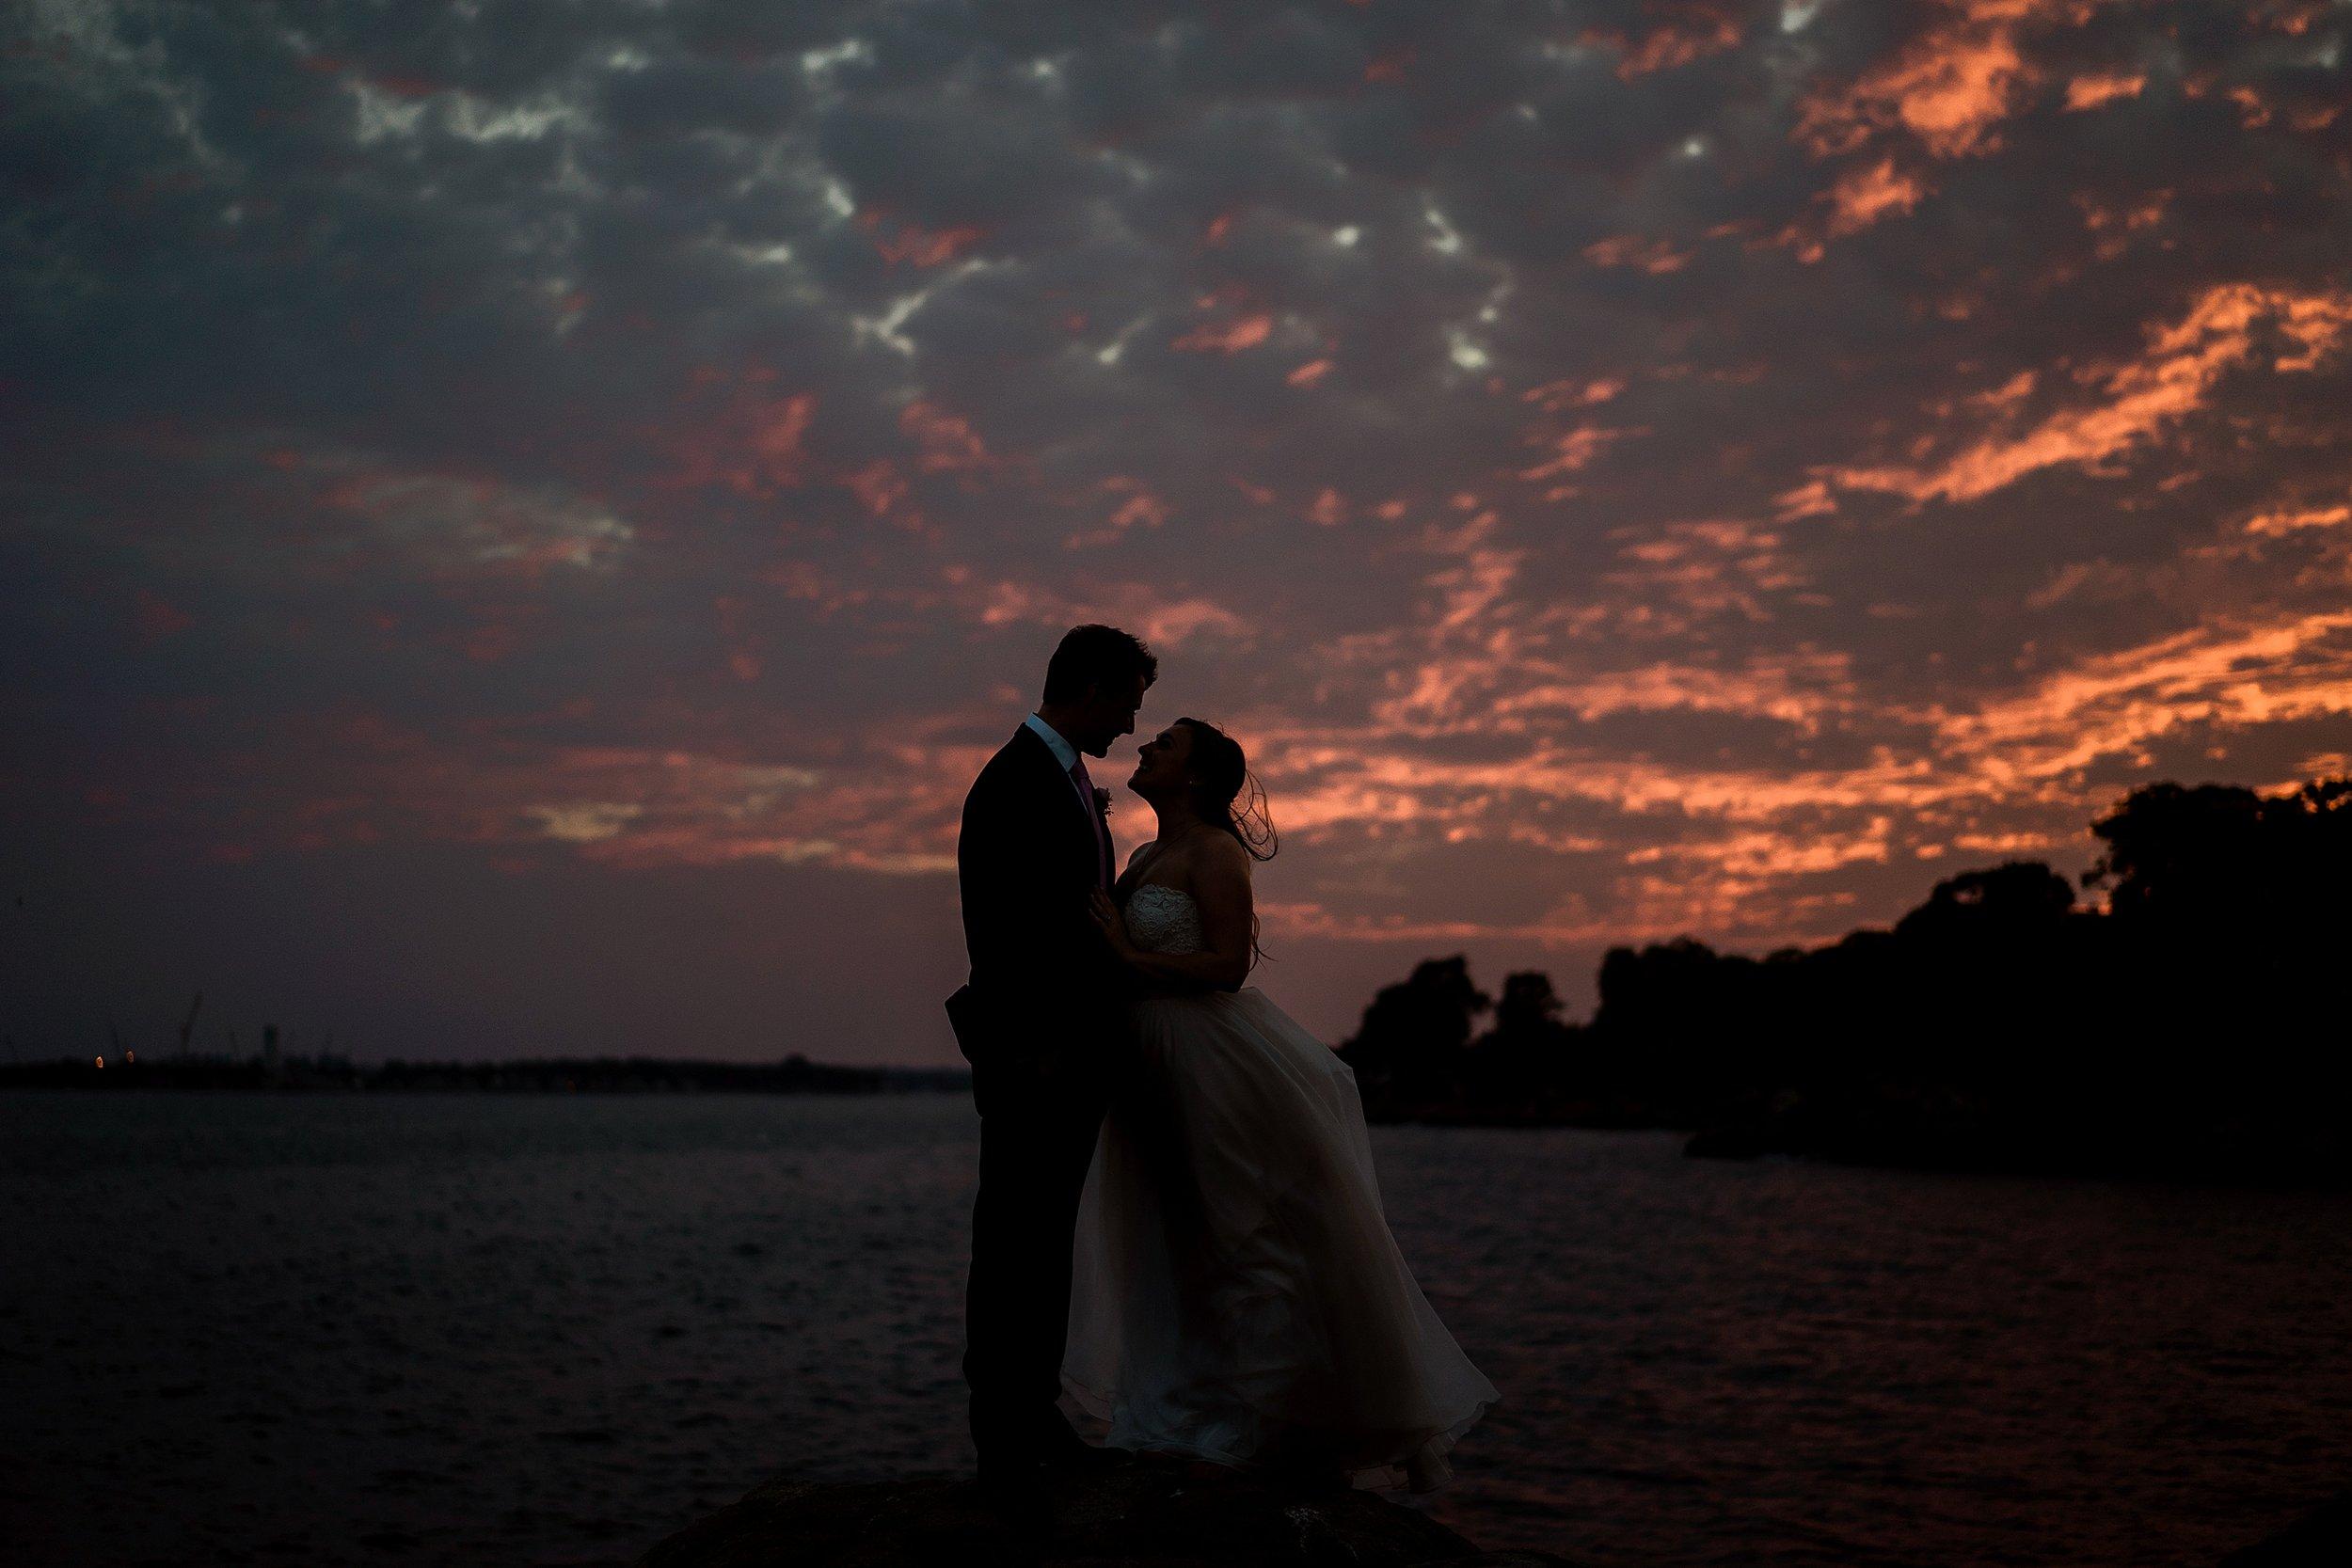 045 los angeles wedding photographer todd danforth photography boston.jpg